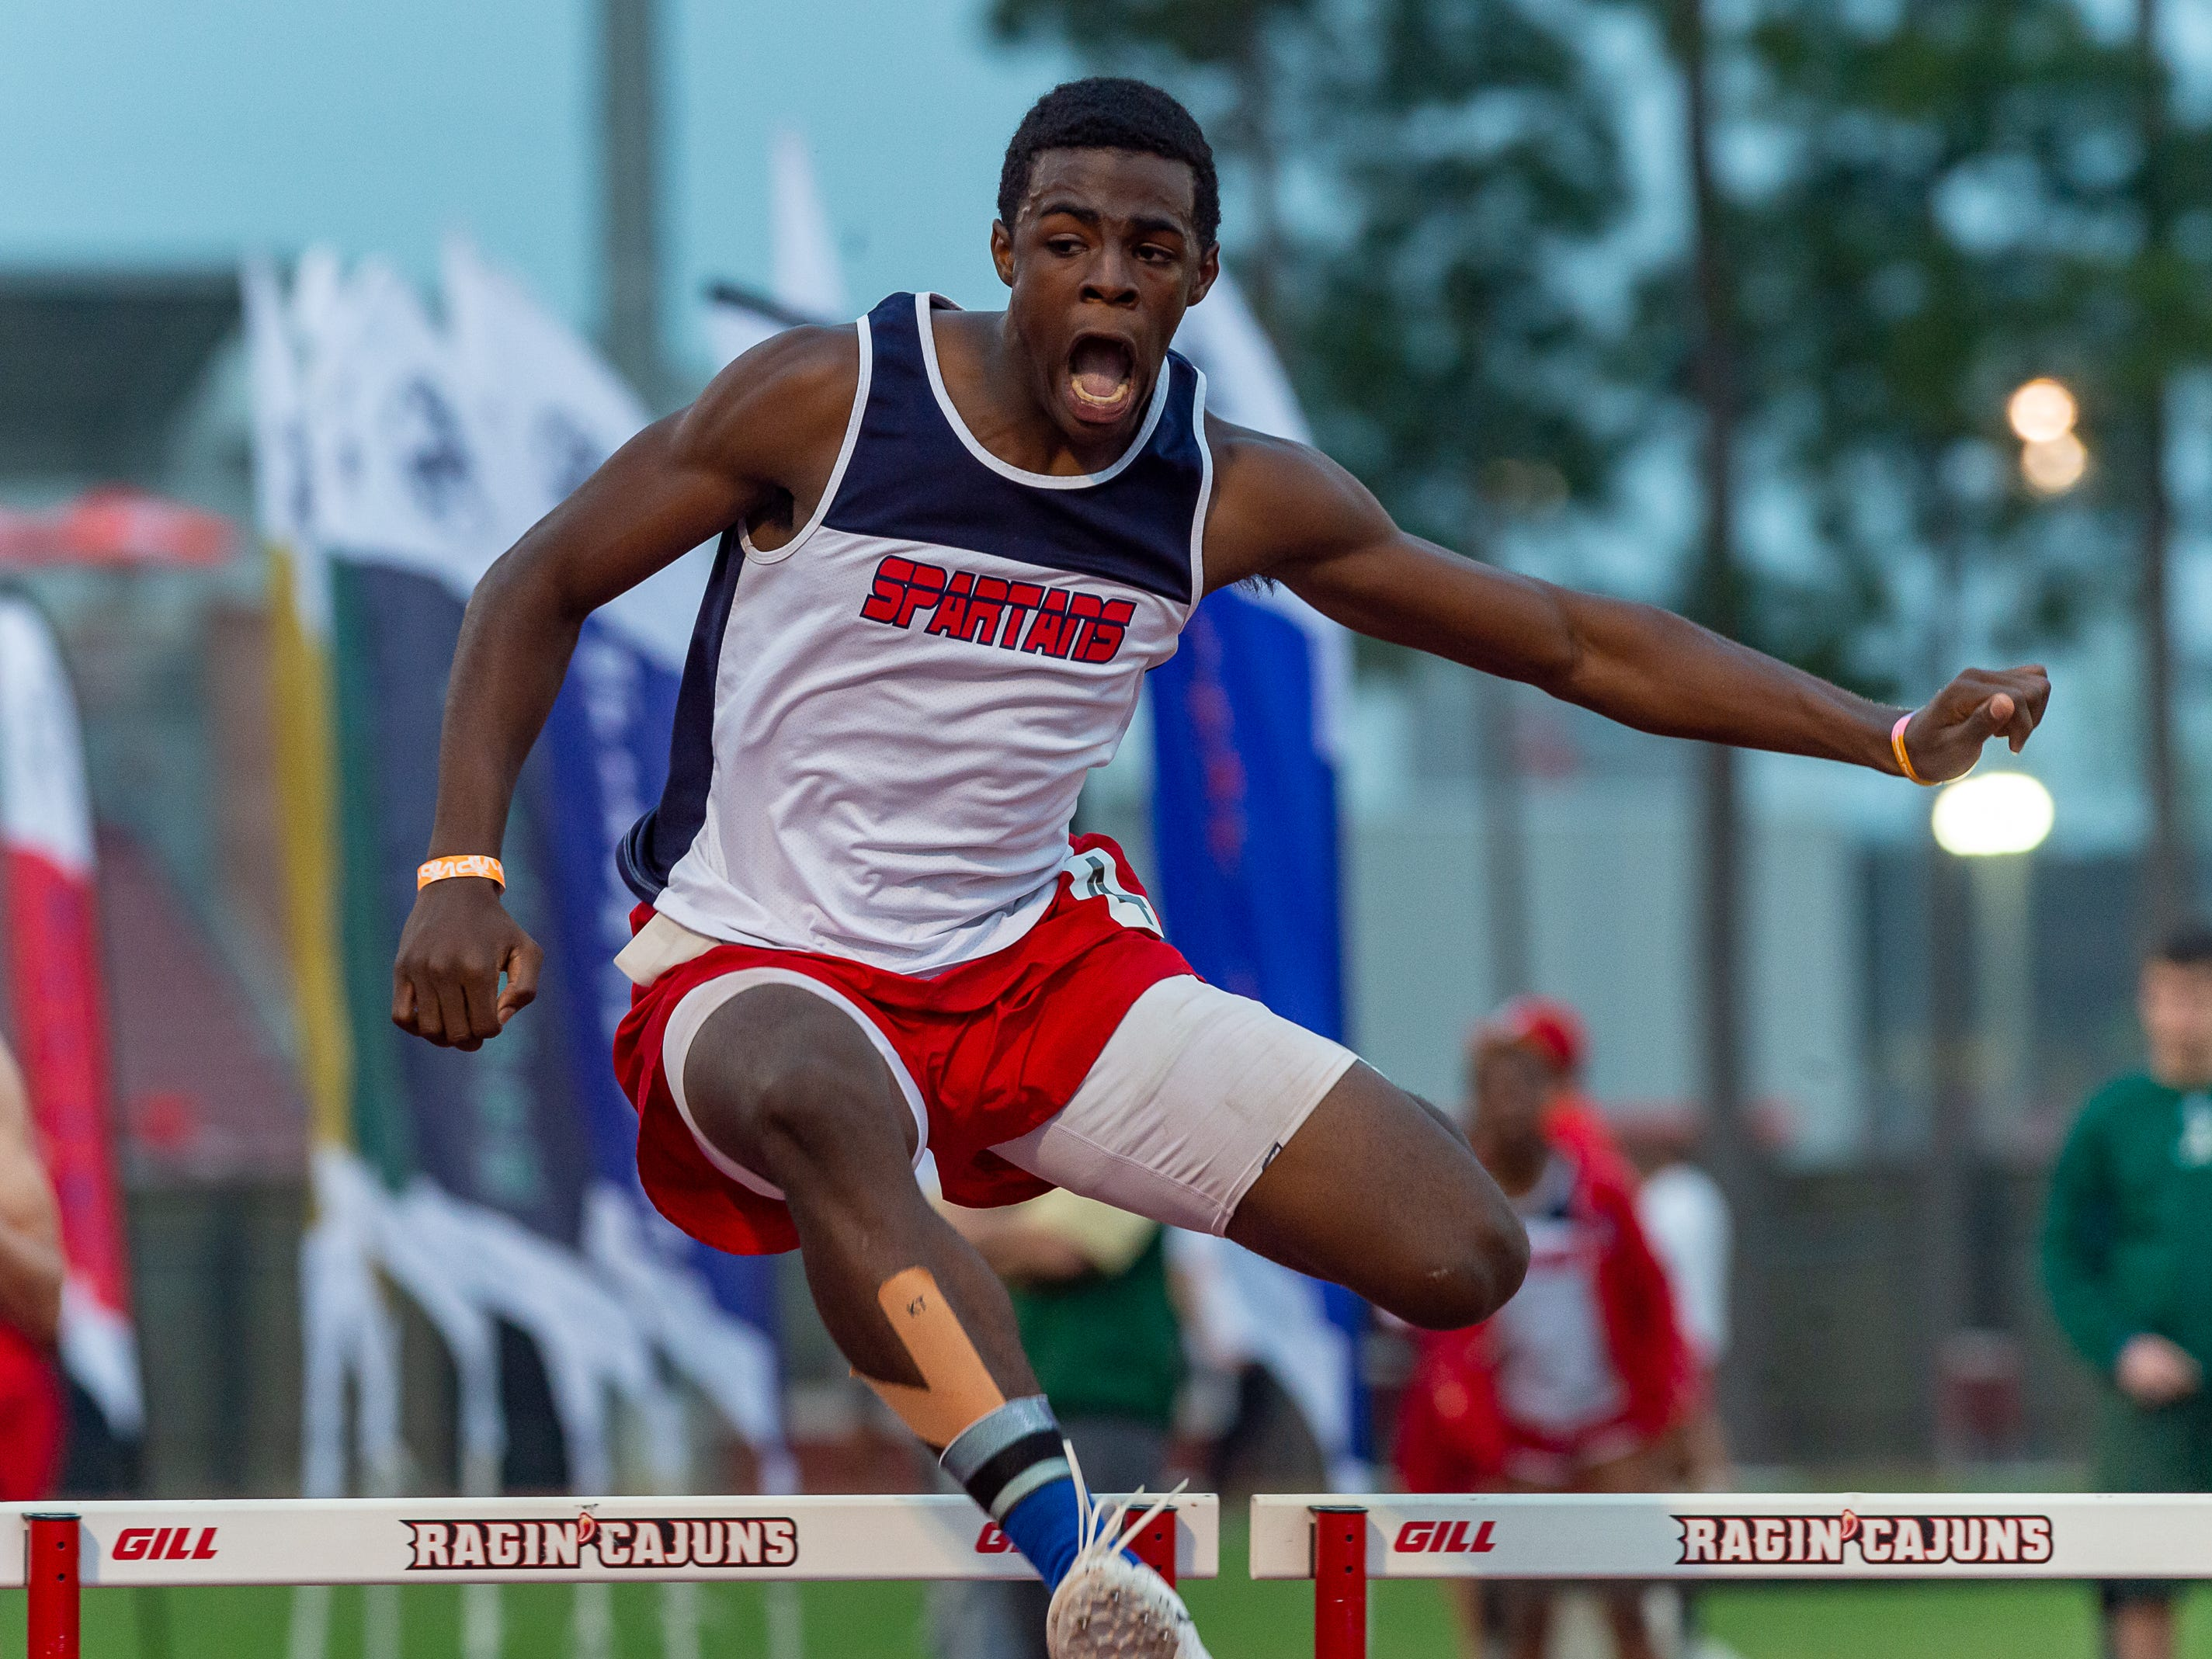 Debonaire Williams wins the 300m hurdles at The 2019 Beaver Club Relays. Friday, April 5, 2019.